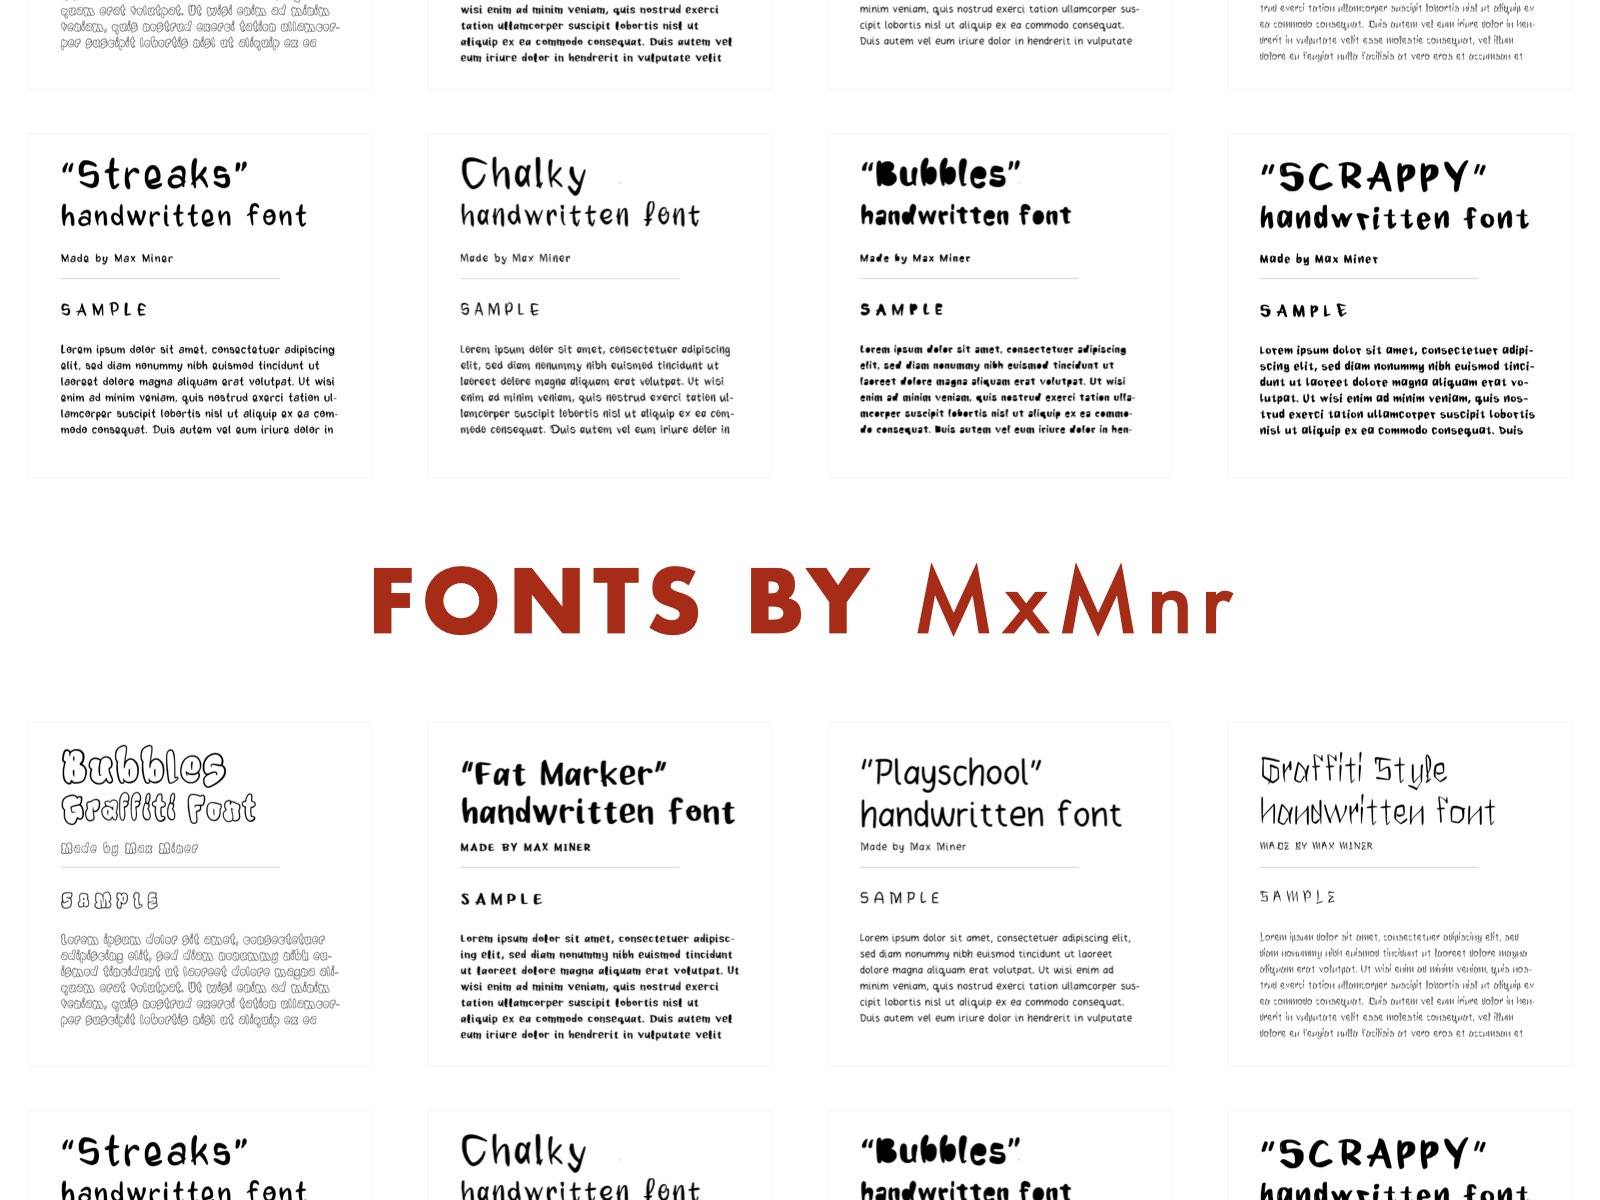 Fonts by MxMnr